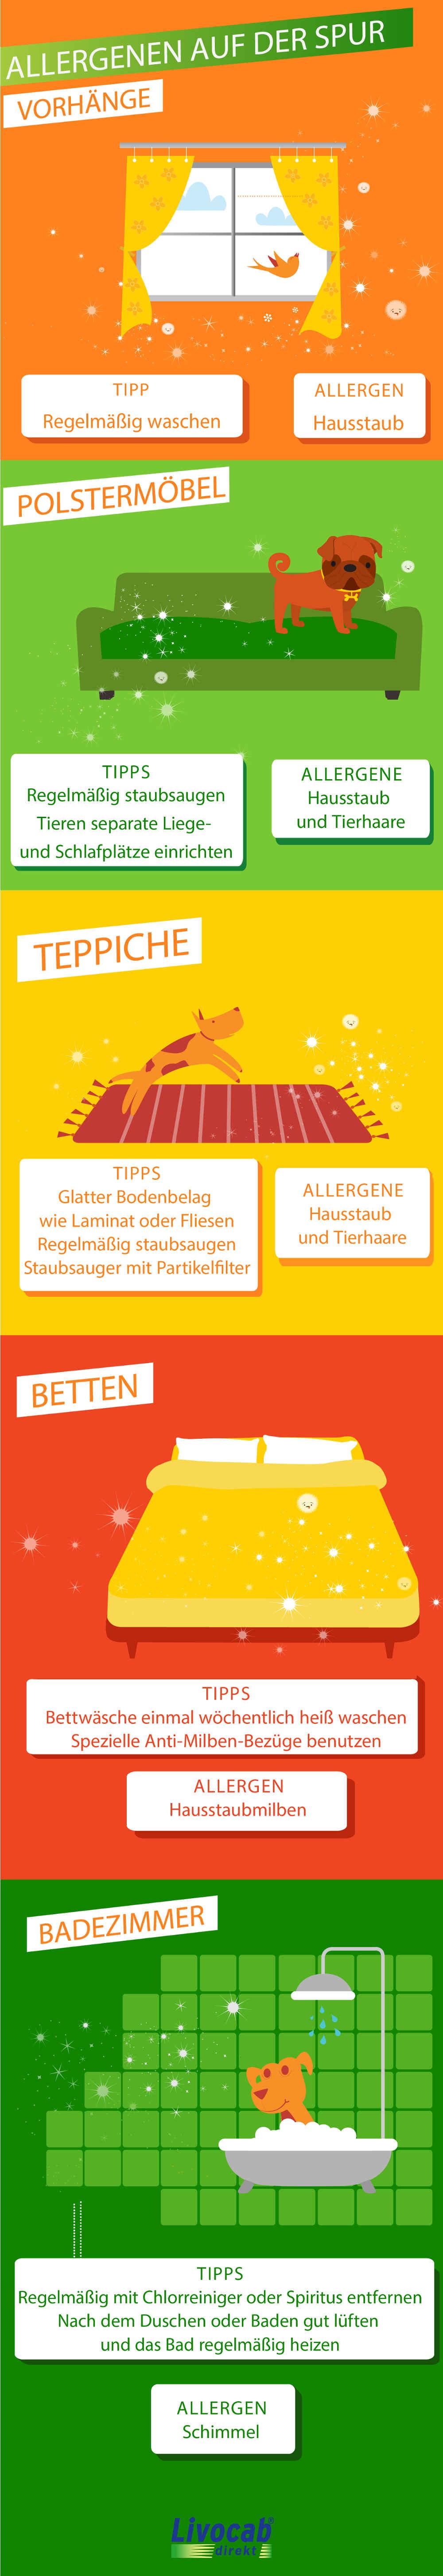 haustauballergie hausstaubmilbenallergie allergieratgeber. Black Bedroom Furniture Sets. Home Design Ideas